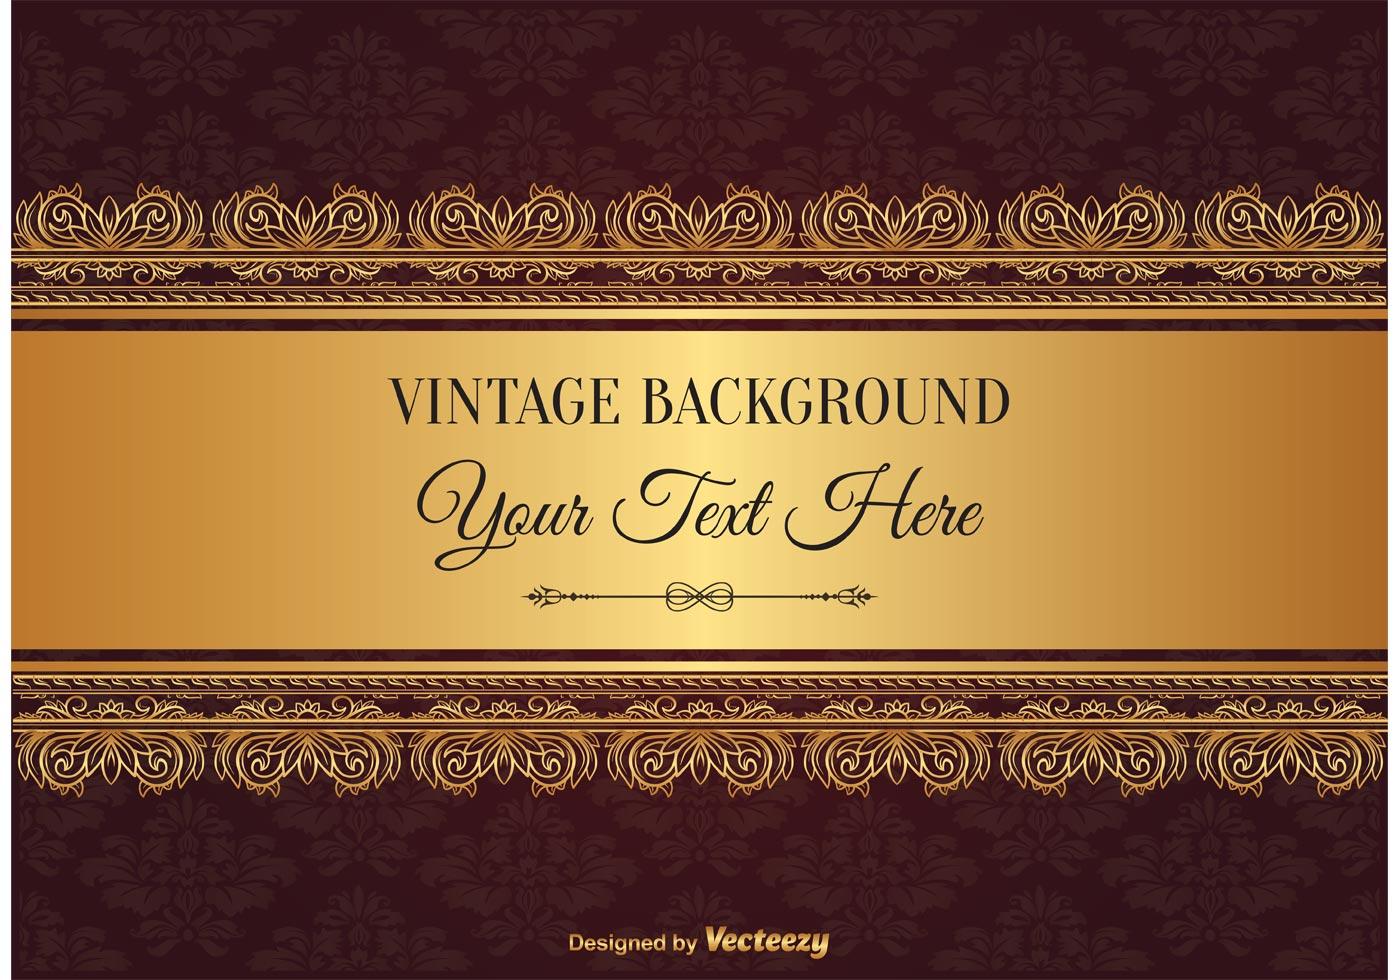 Elegant vintage style background download free vector art stock